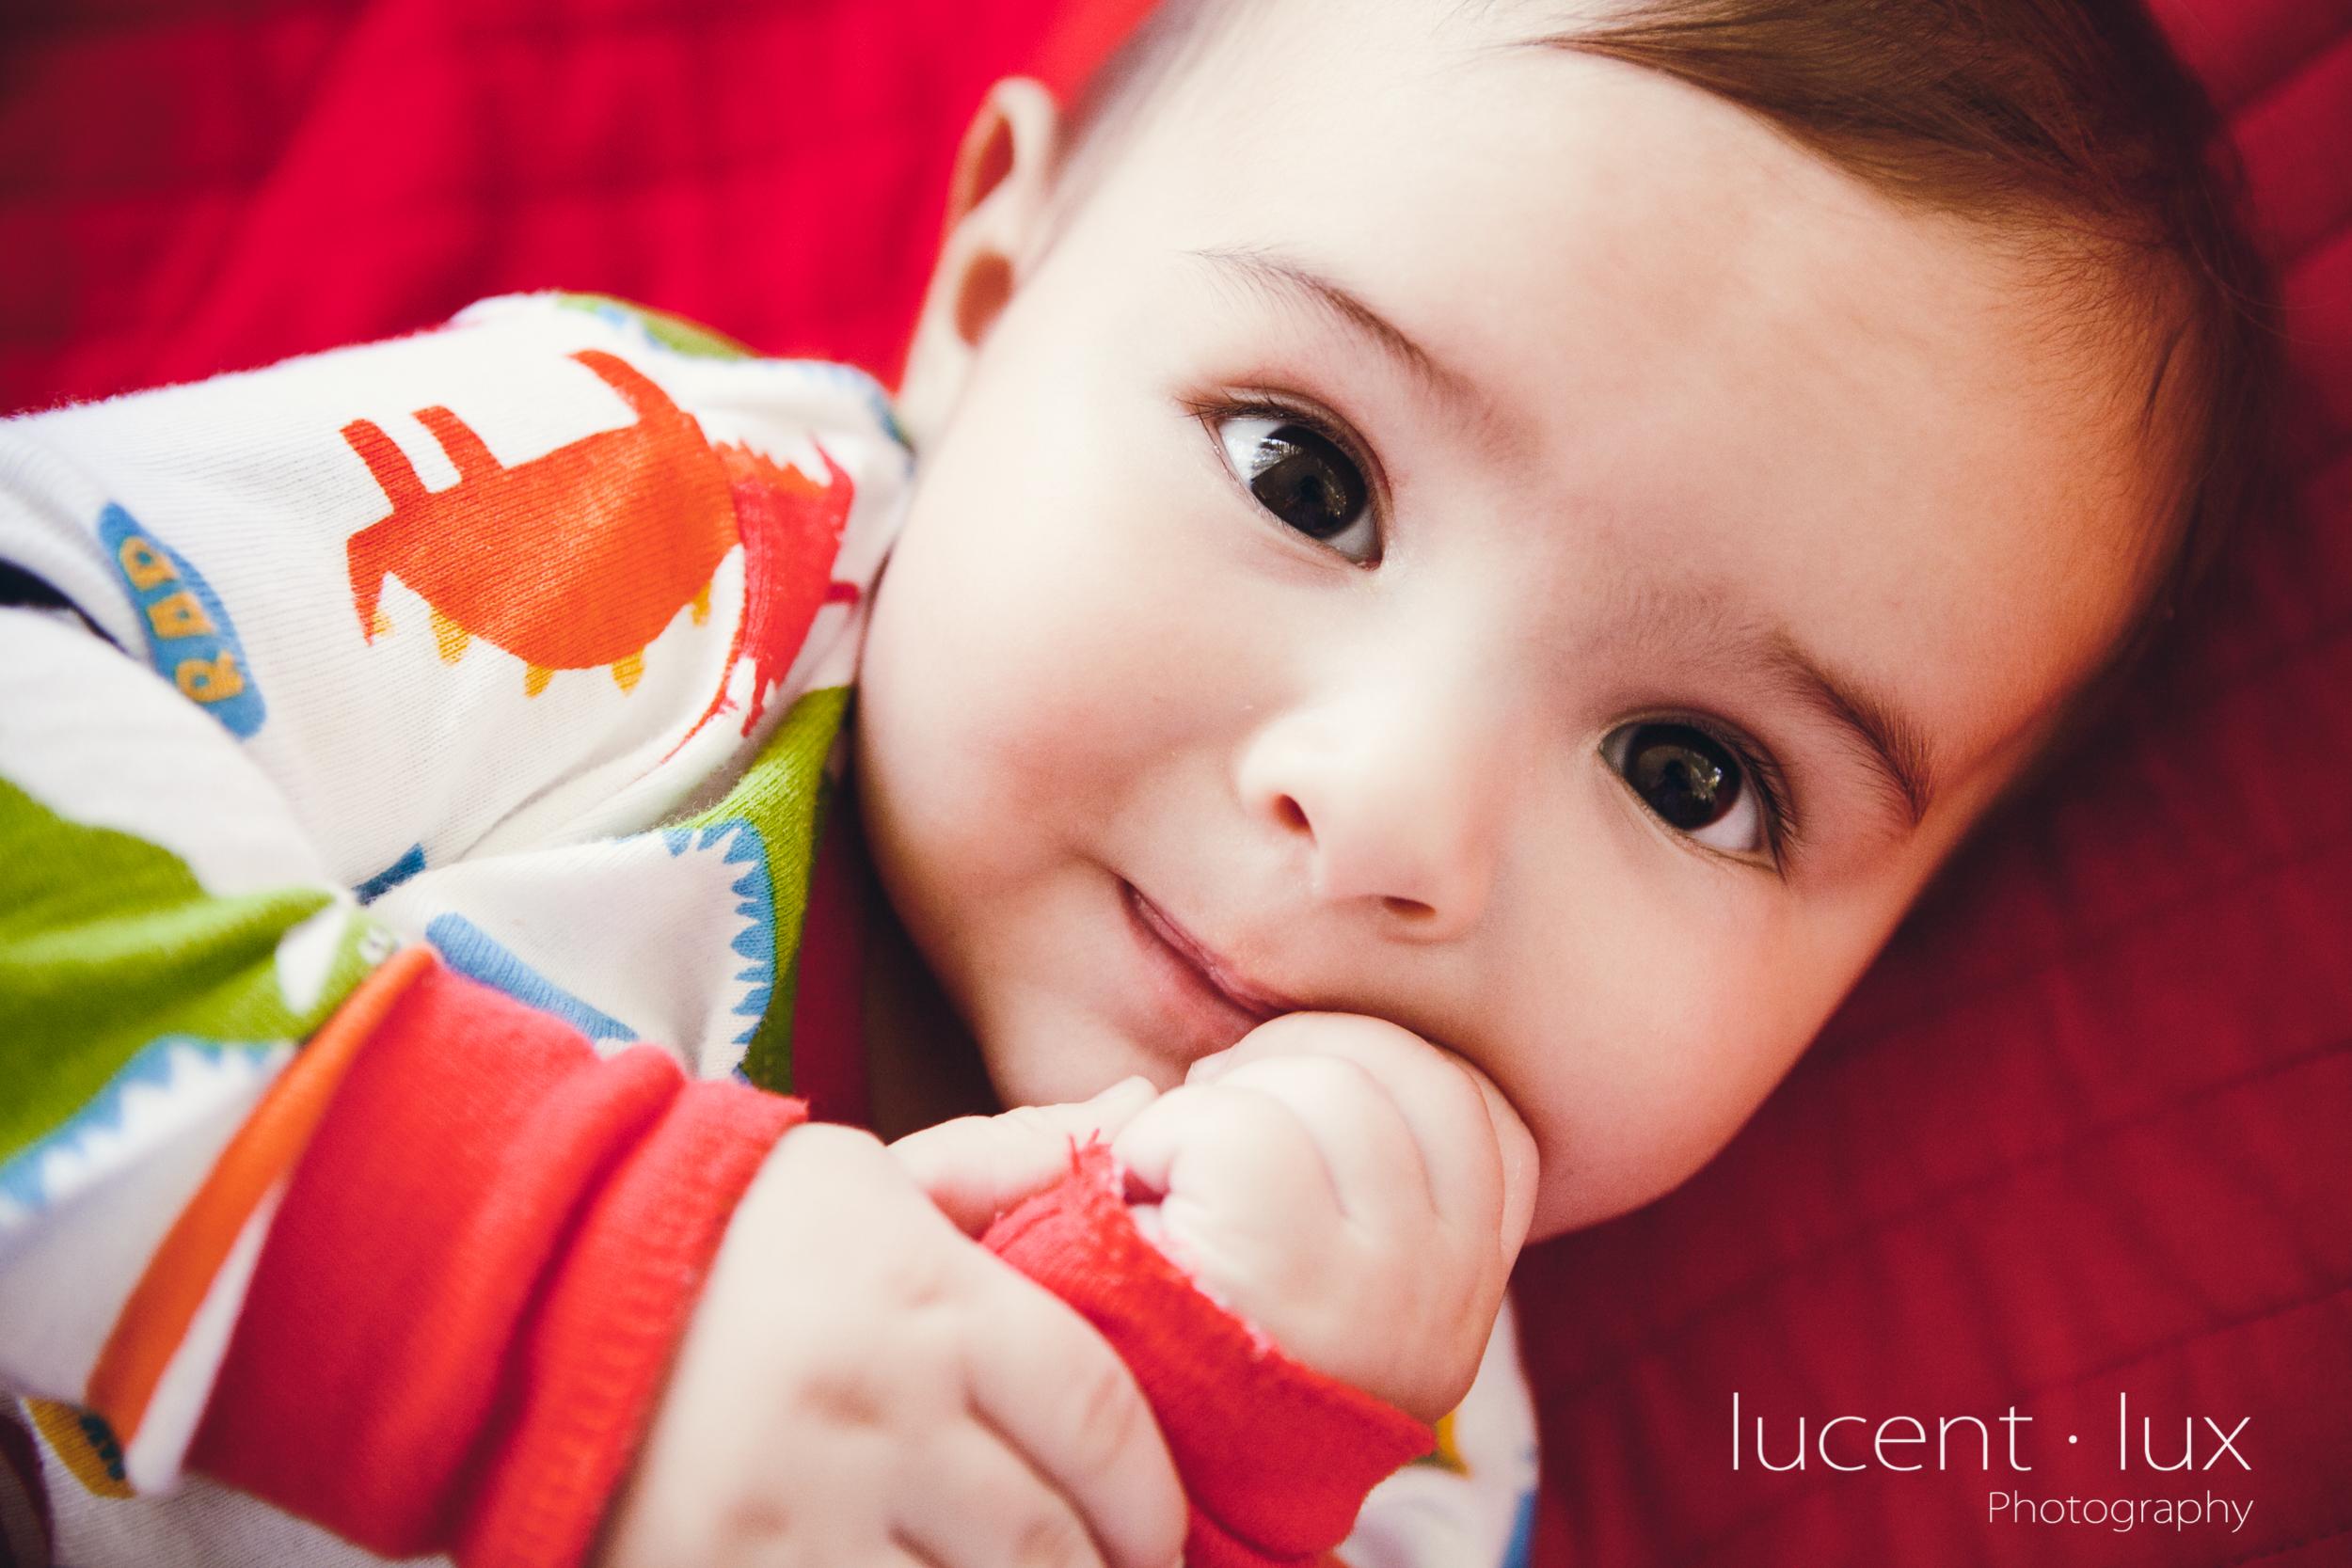 Baltimore-Newborn-Maryland-Maternity-Newborn-Photography-Washington-DC-Photographer-Portrait-Children-Baby-Photography-Family-Portraits-125.jpg